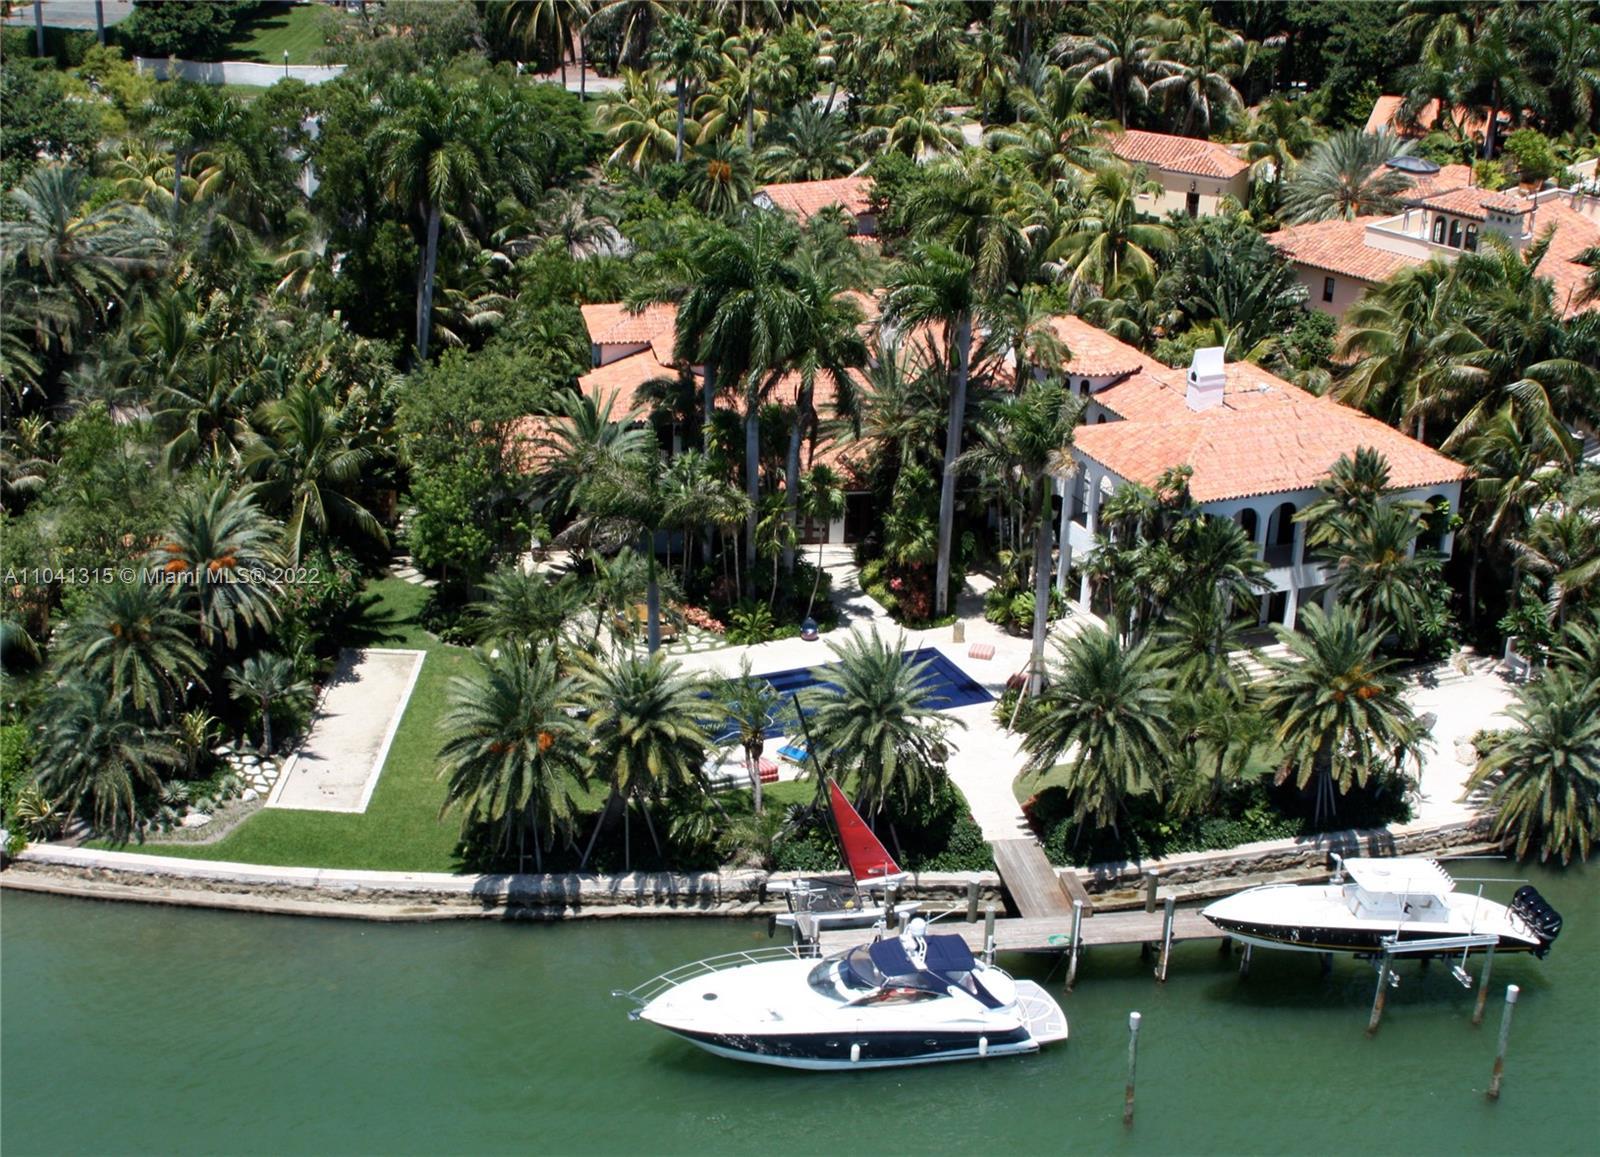 16 Palm Ave, Miami Beach, Florida 33139